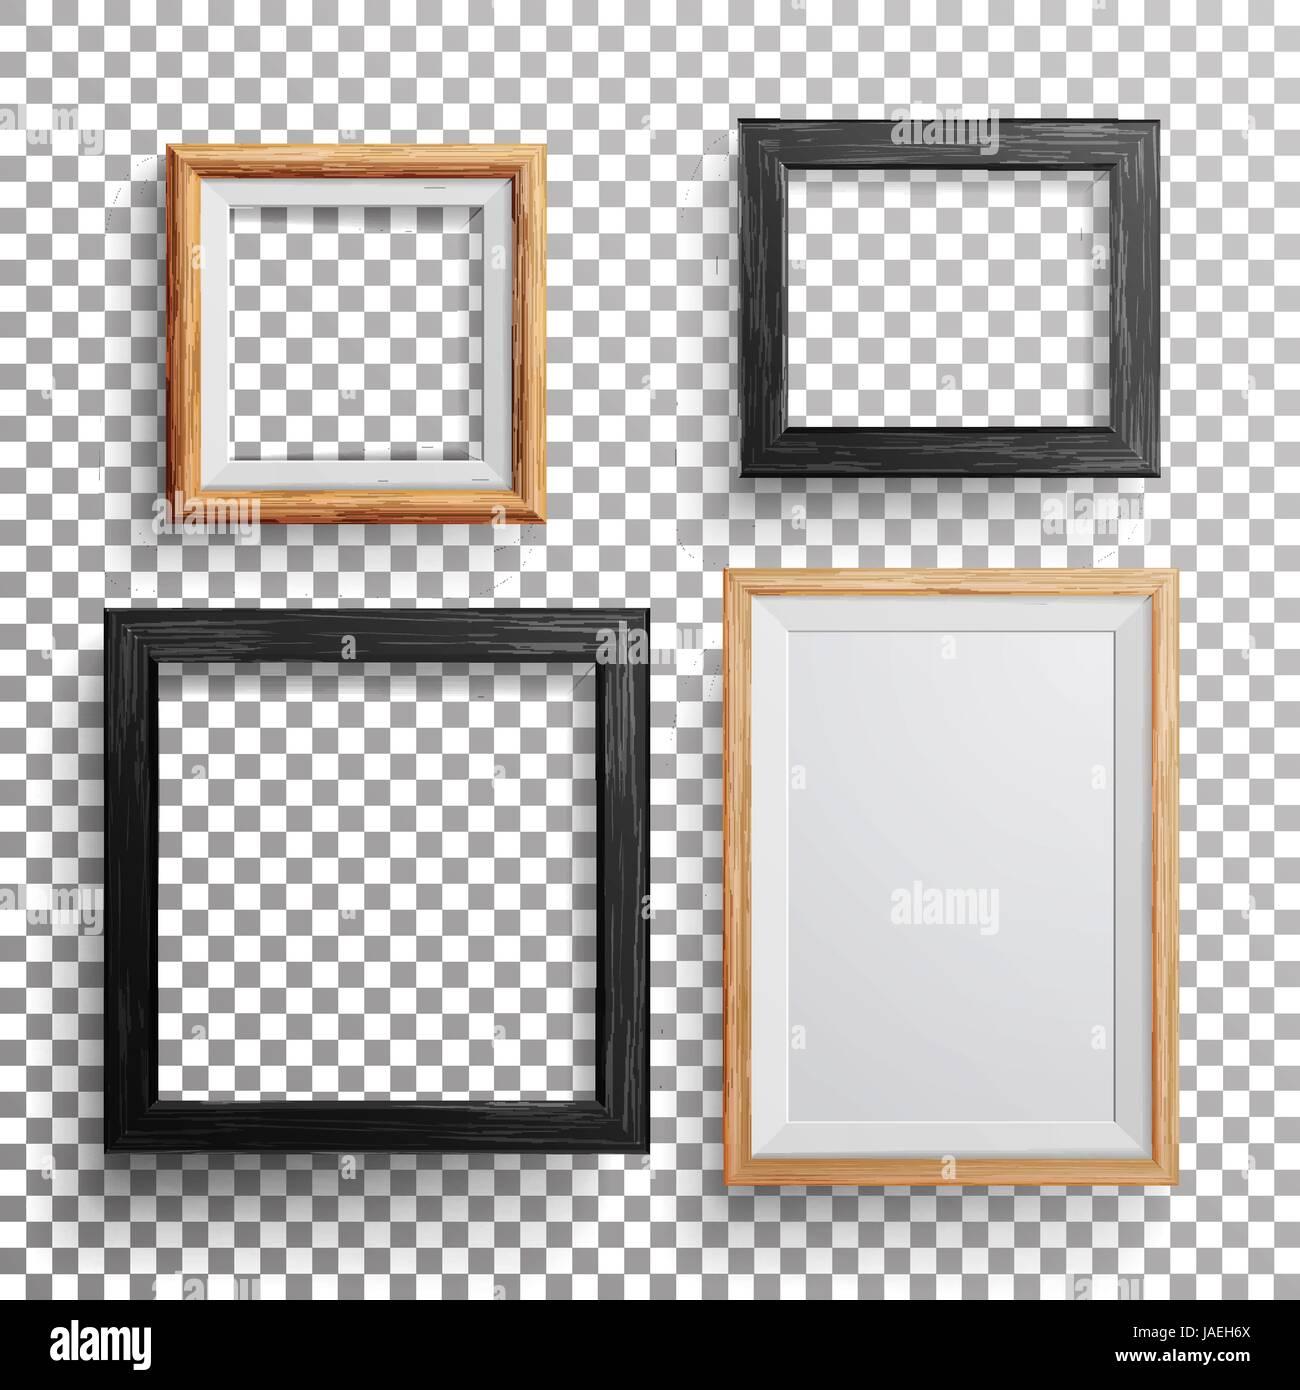 Realistische Foto Frame Vector. 3D Zeichendreieck, A3, A4 Größen ...